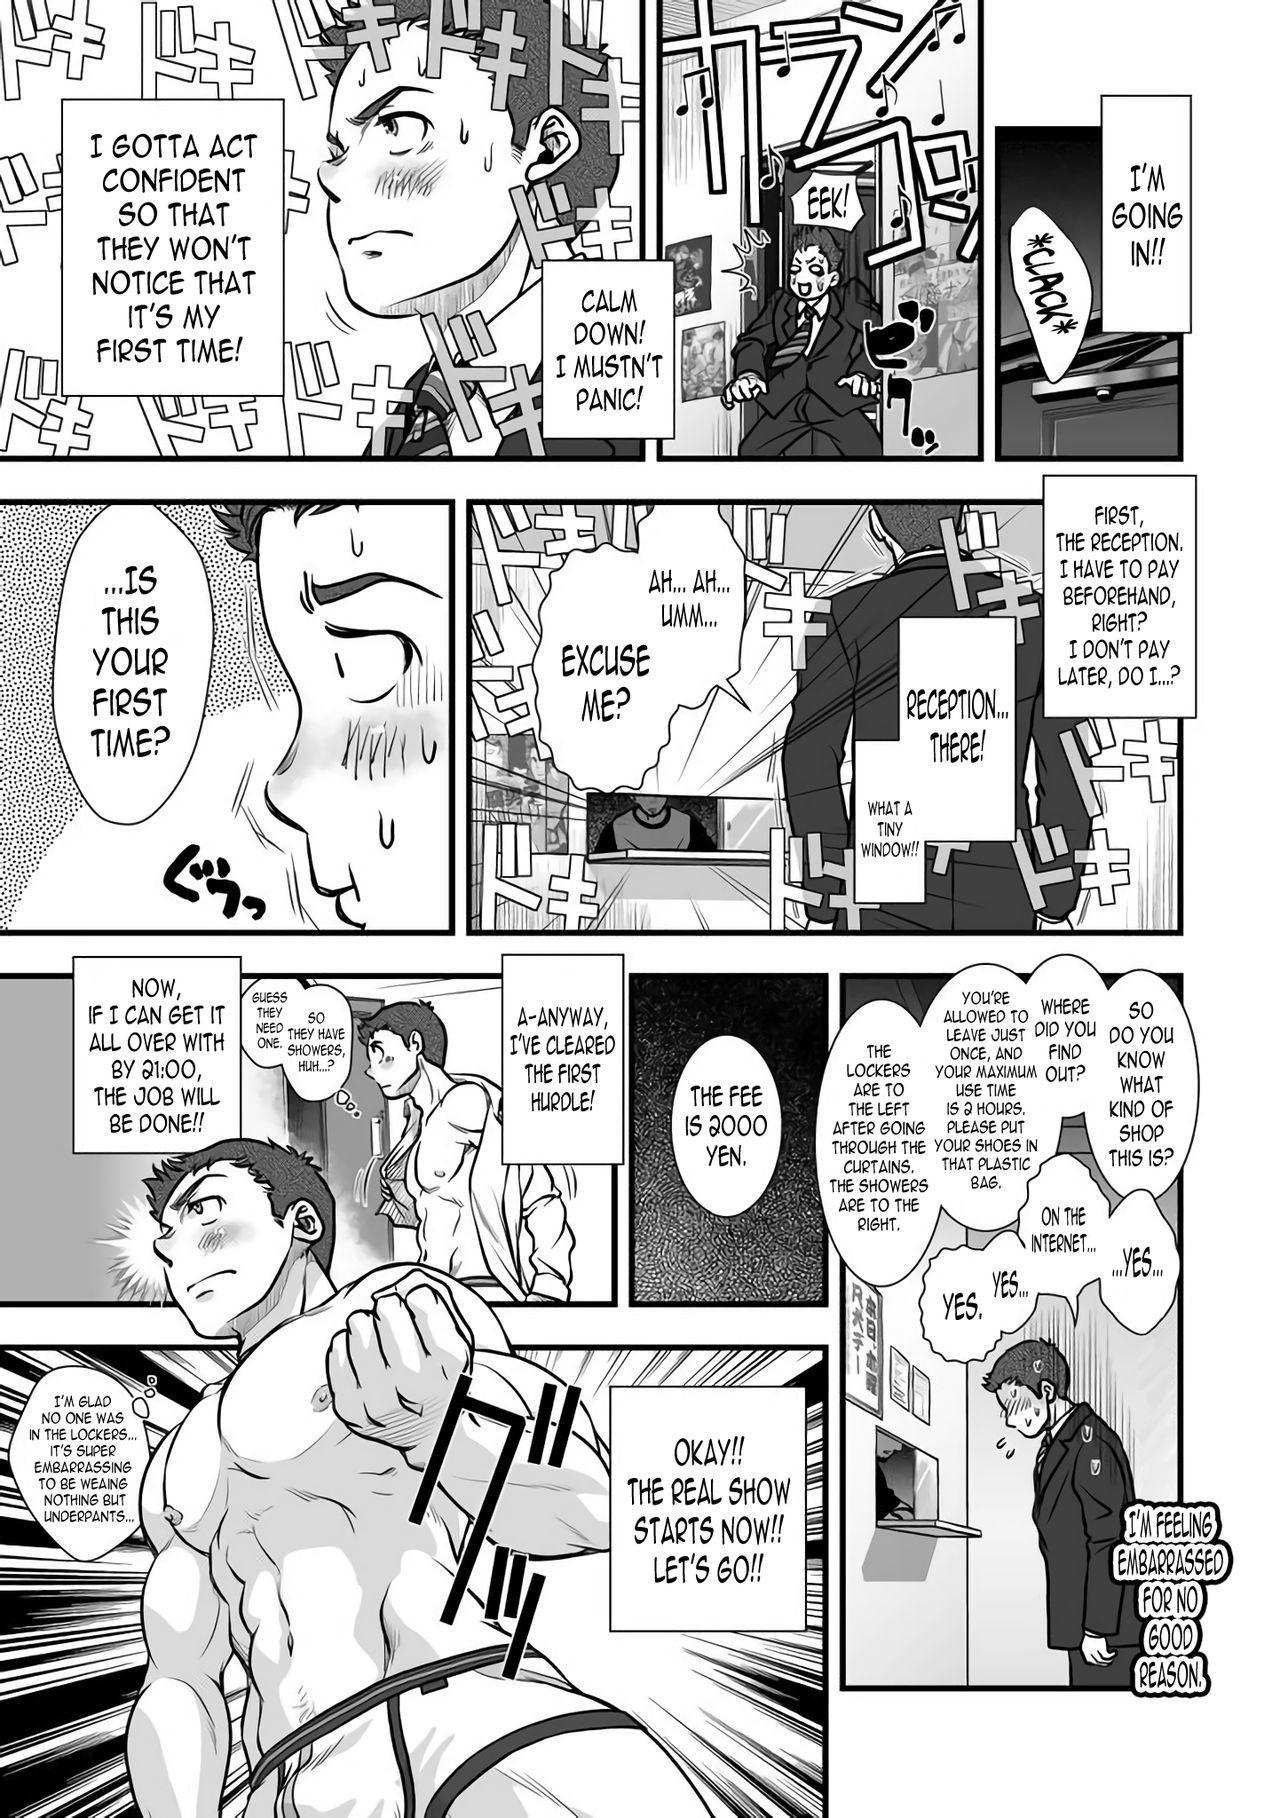 [Pagumiee (Kenta)] Tatakae!+++ (Plus-san)!! [English] [N04h] [Digital] 36